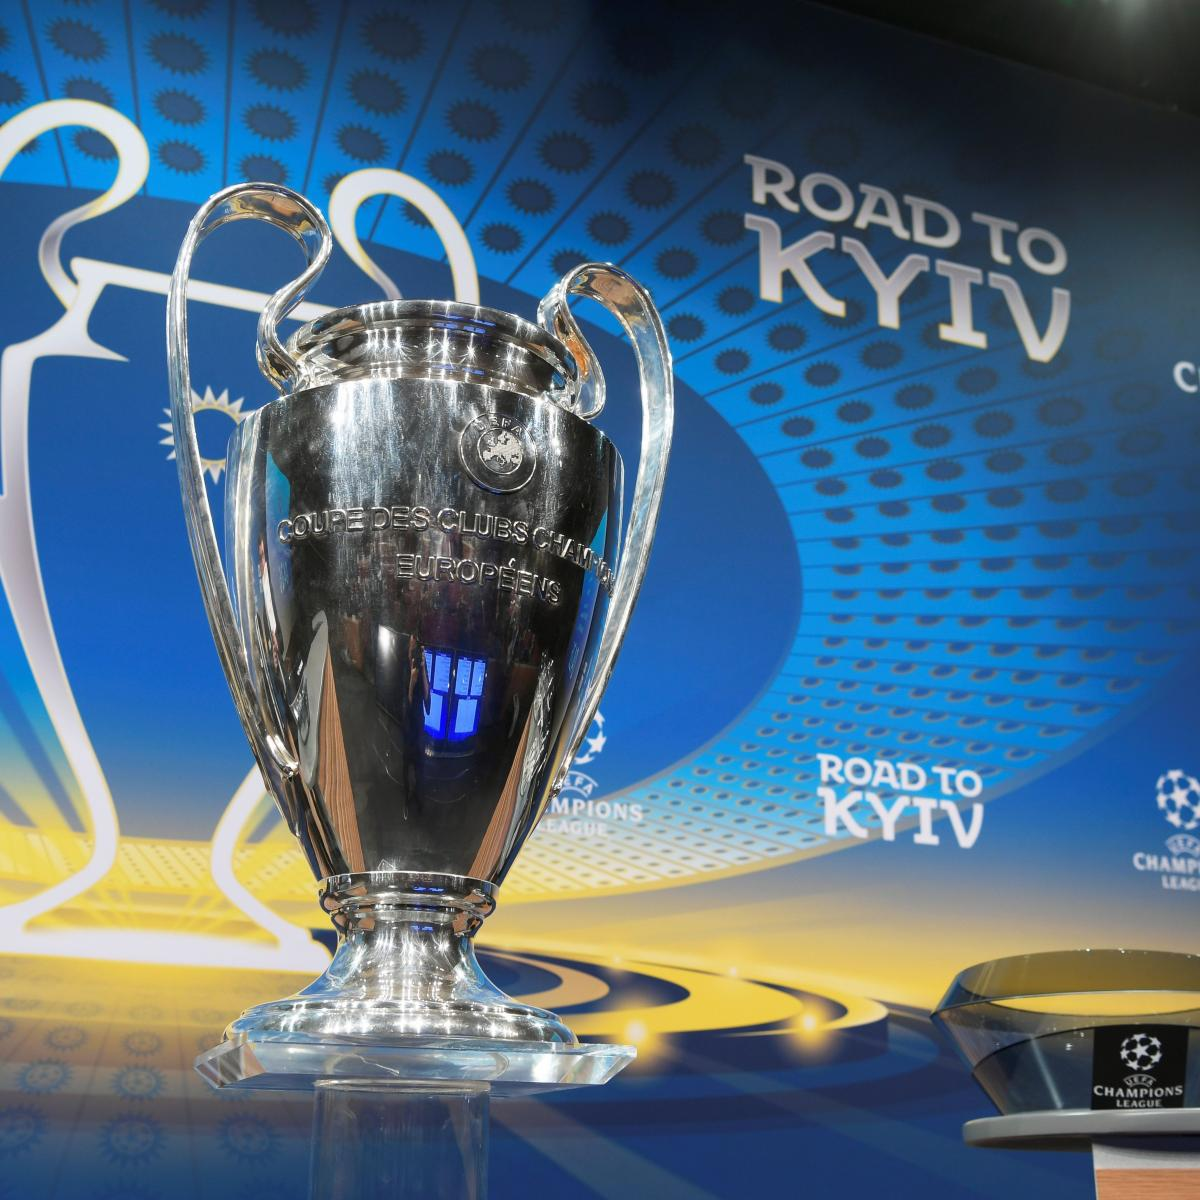 Champions League Tv